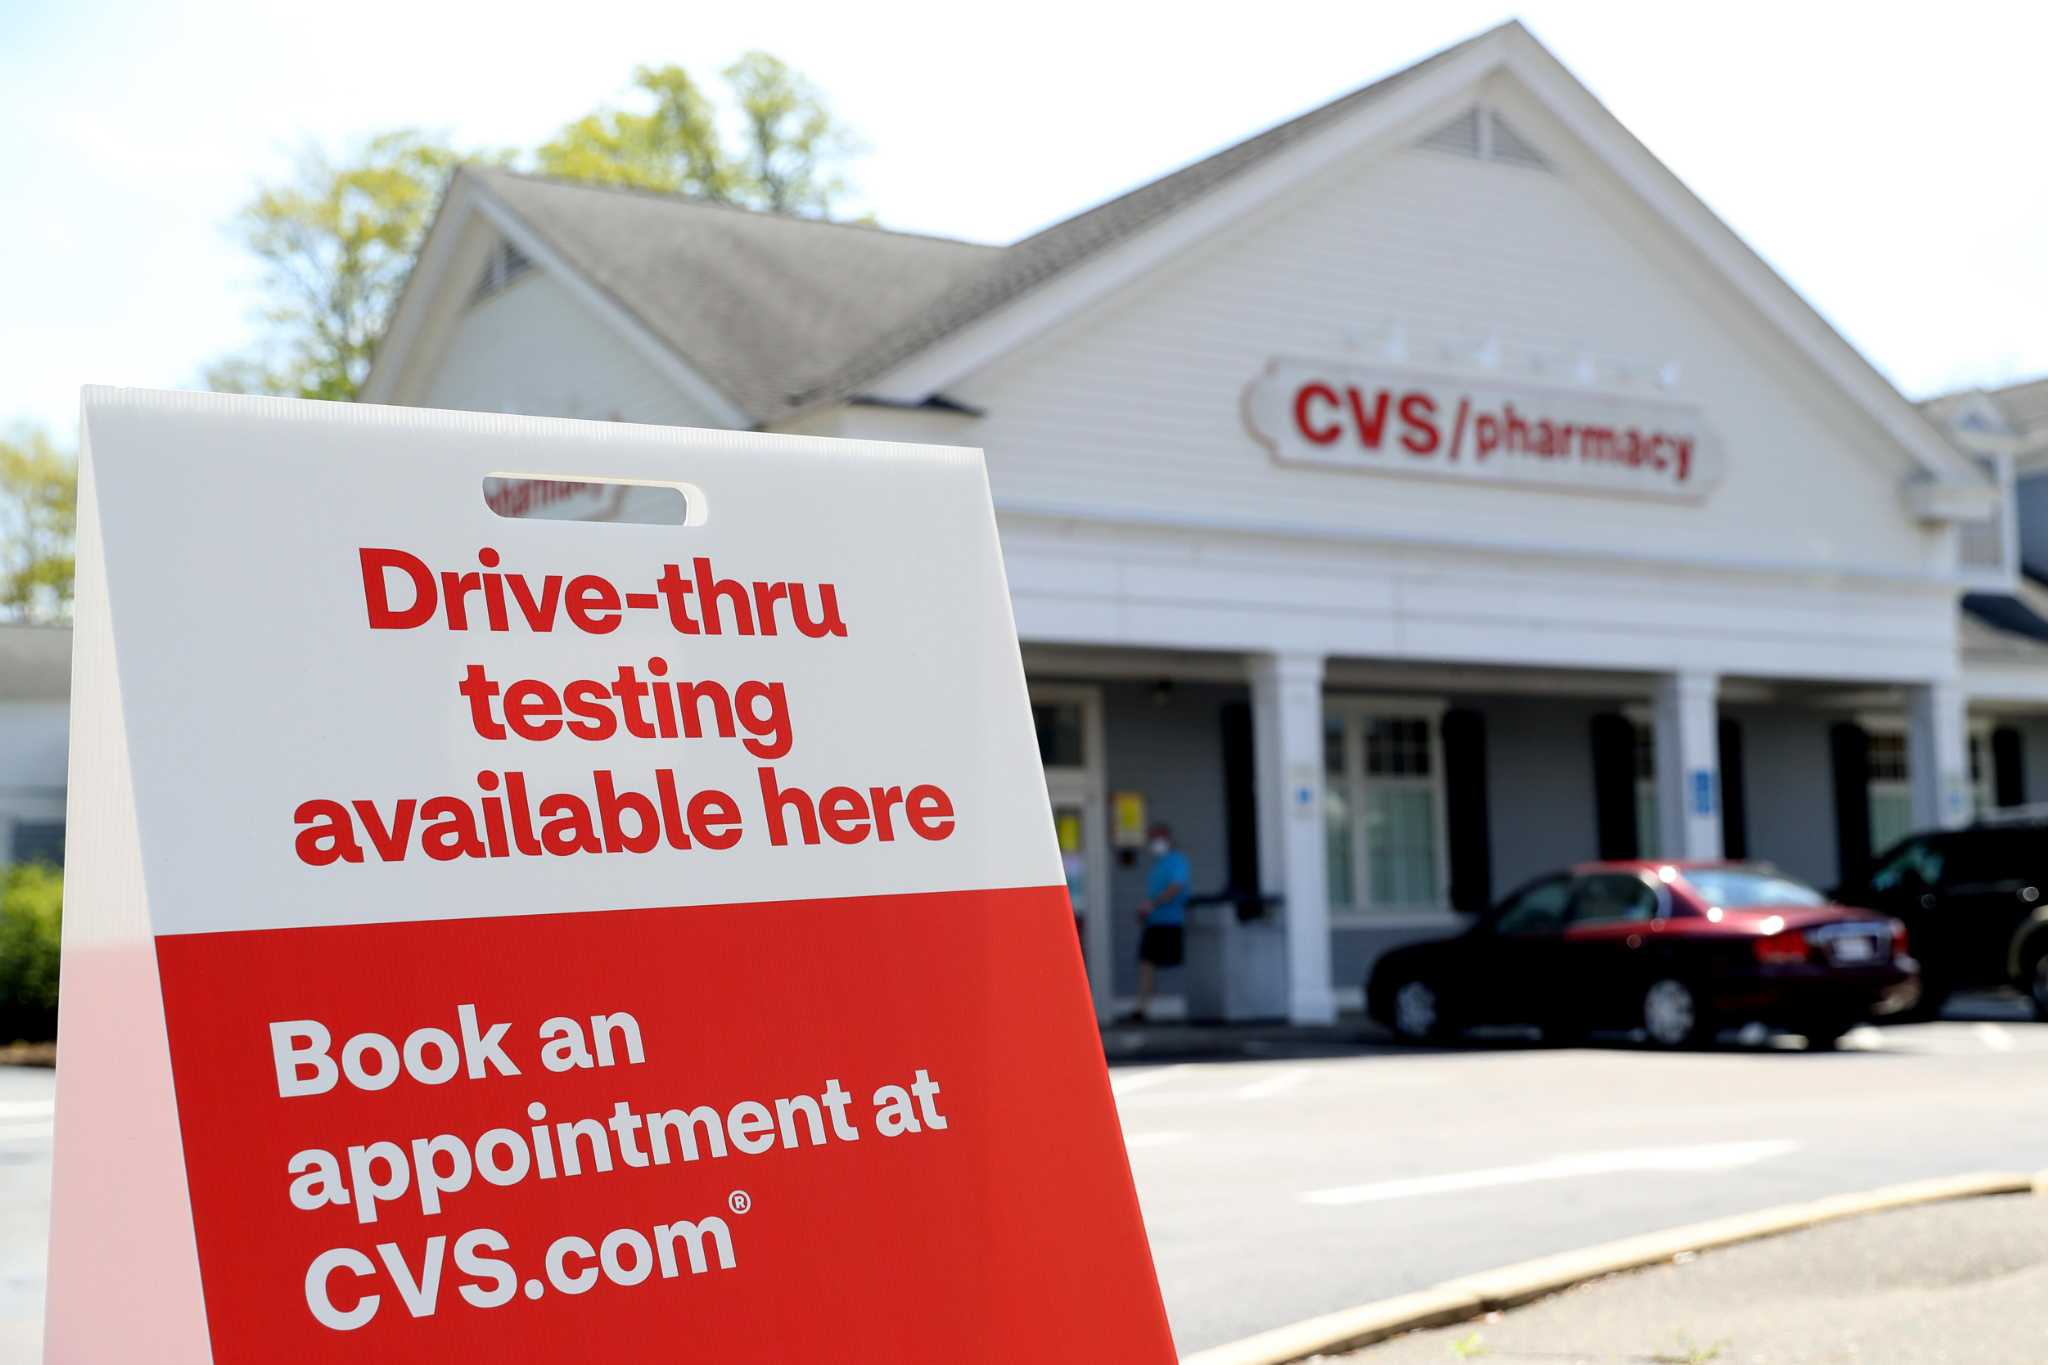 Cvs Adds 13 Coronavirus Testing Sites In Ct Including West Haven